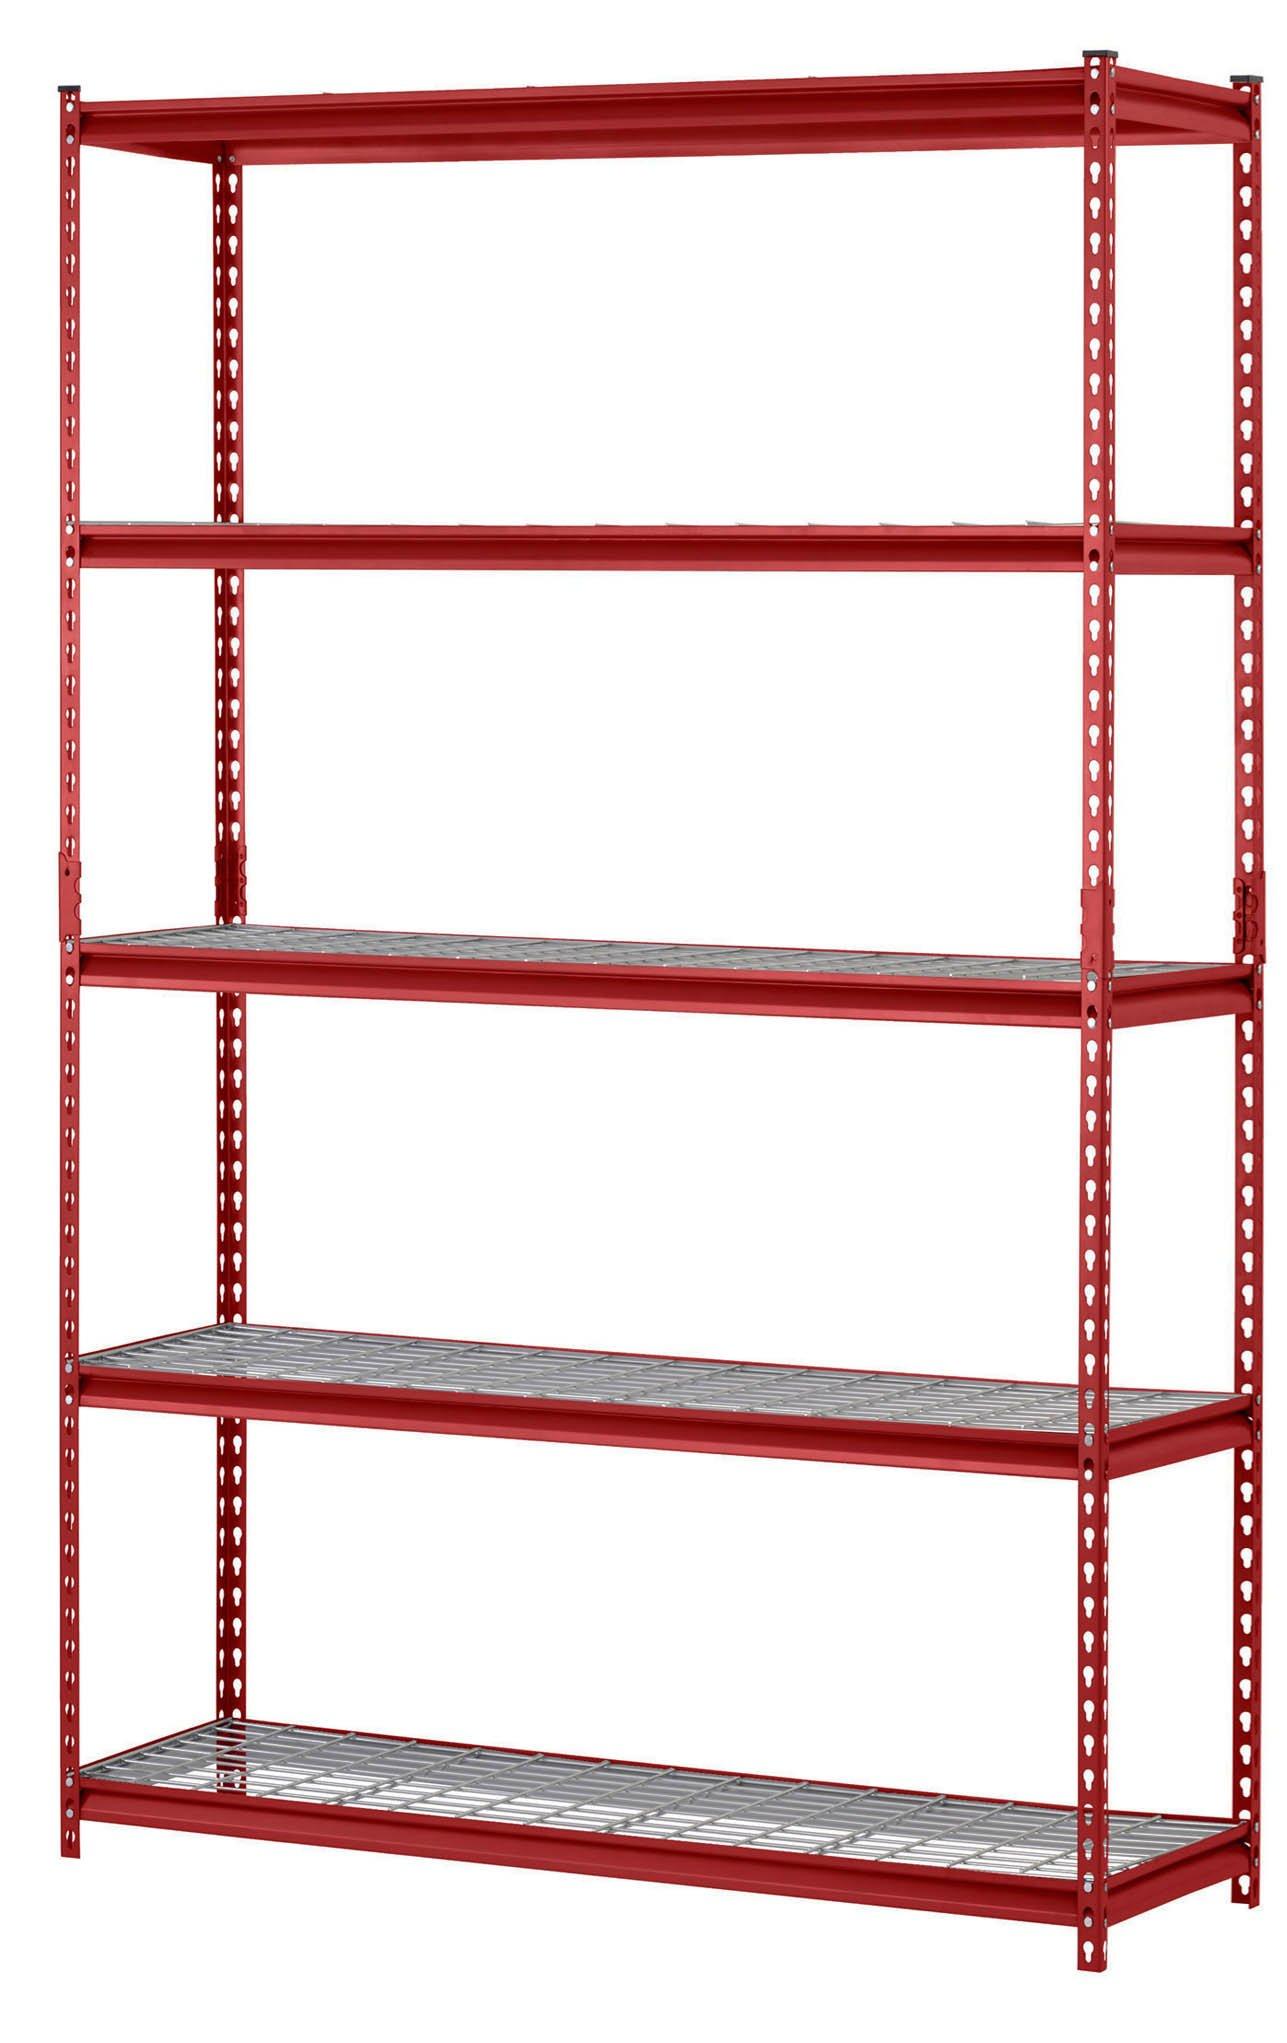 Muscle Rack UR184872-R 5-Shelf Steel Shelving Unit, 48'' Width x 72'' Height x 18'' Length, Red by Muscle Rack